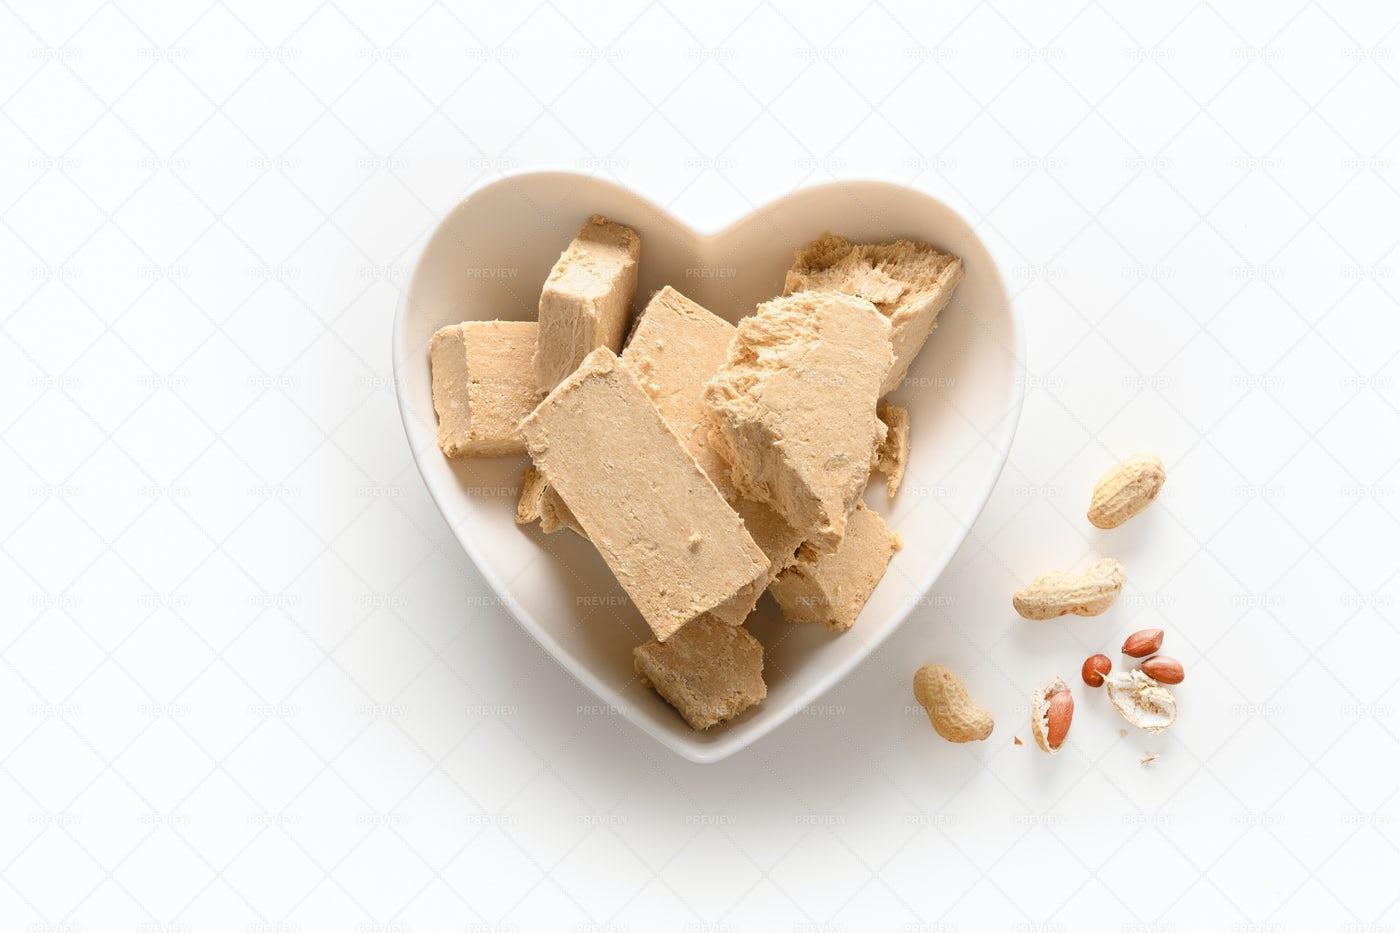 Sweet Dessert Peanuts Halva On White Bac: Stock Photos